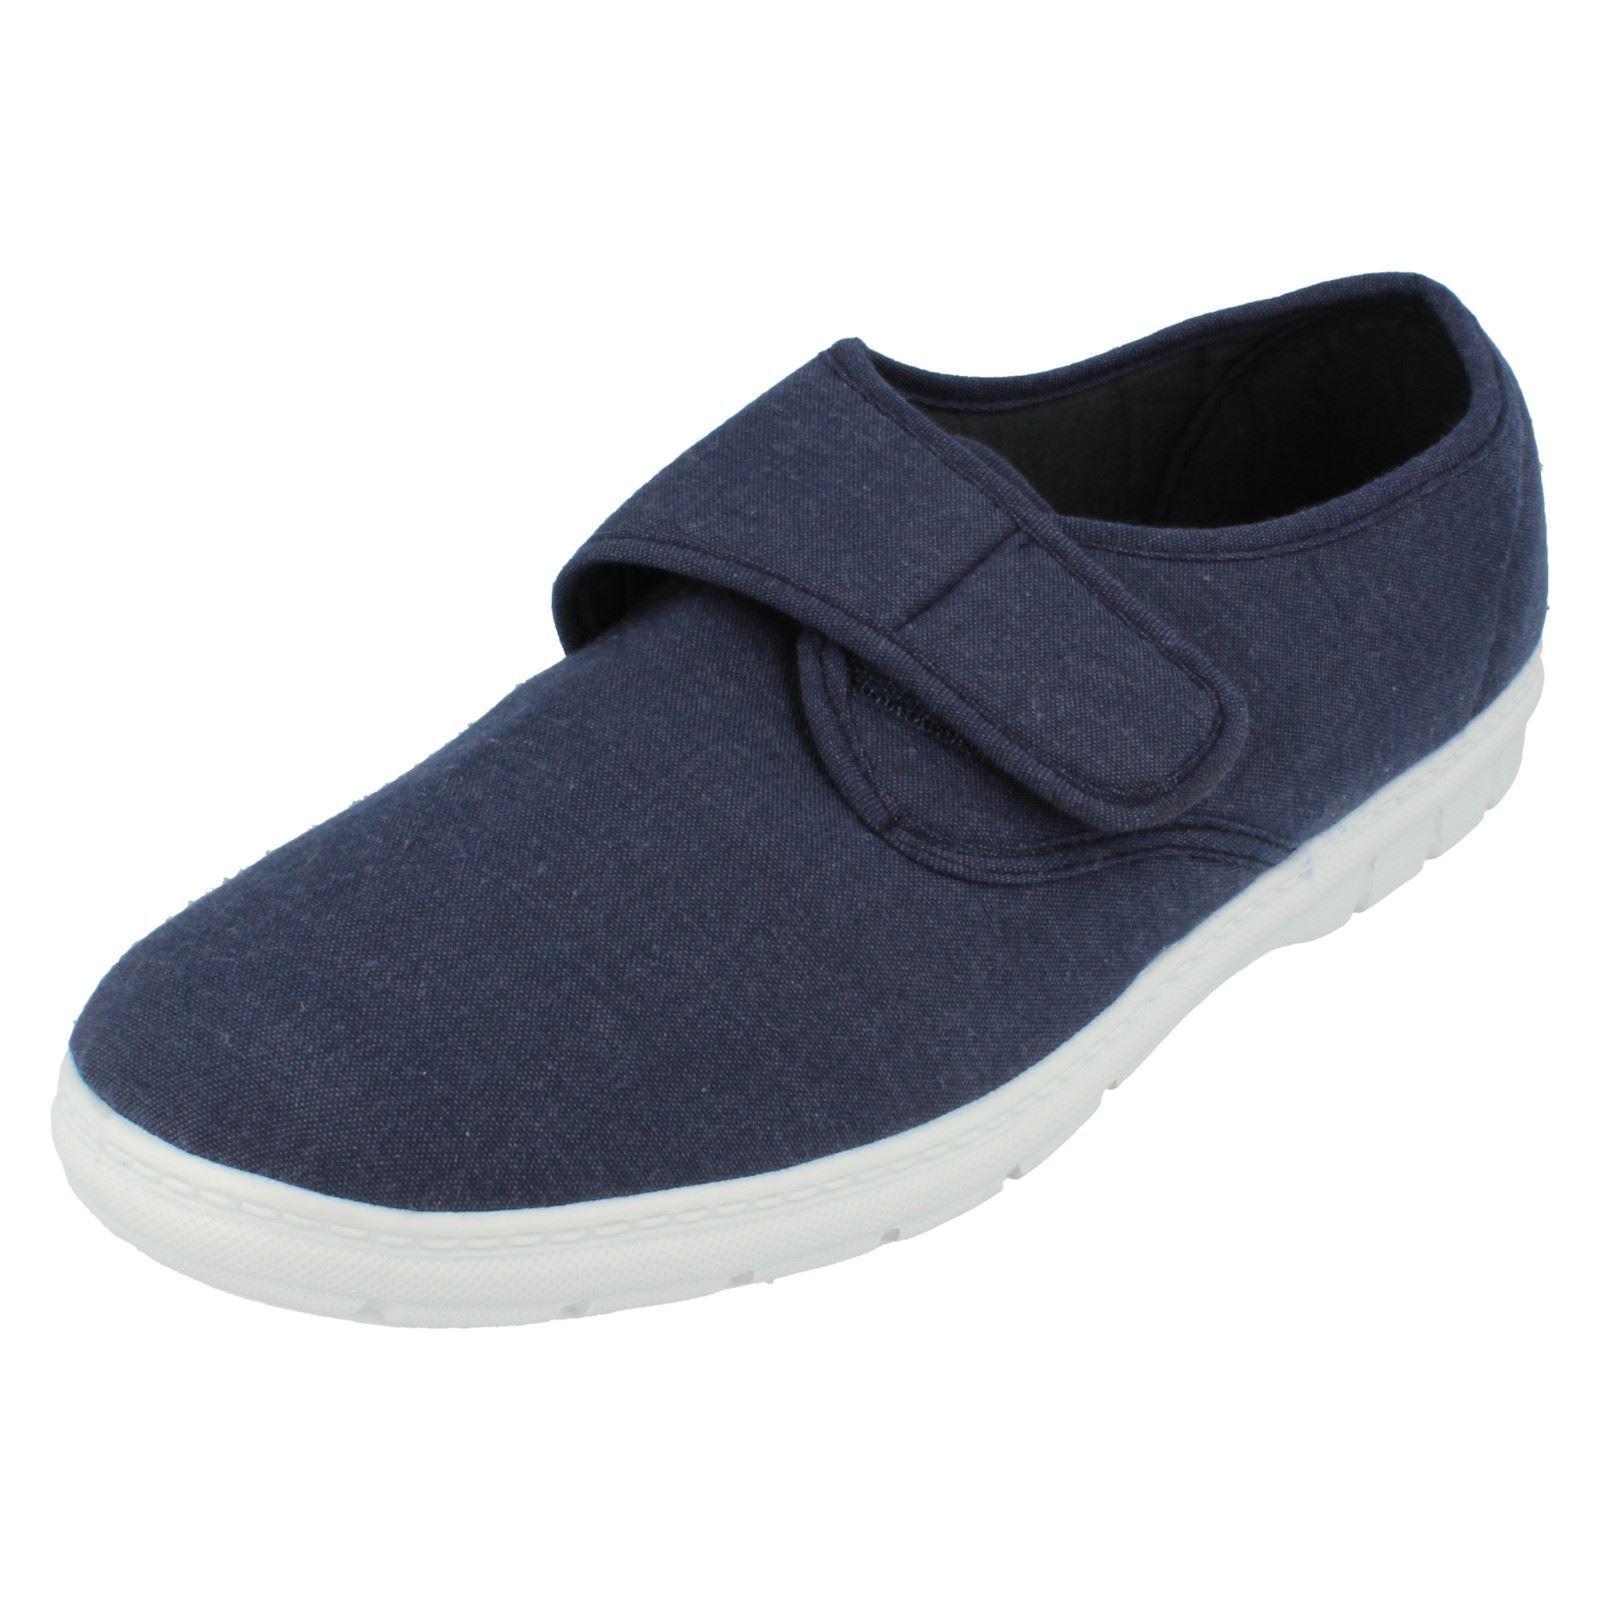 Men's/Women's - Mens Classics Navy Shoes - Men's/Women's Arthur Strong heat and wear resistance Stylish and fun Human border 295619